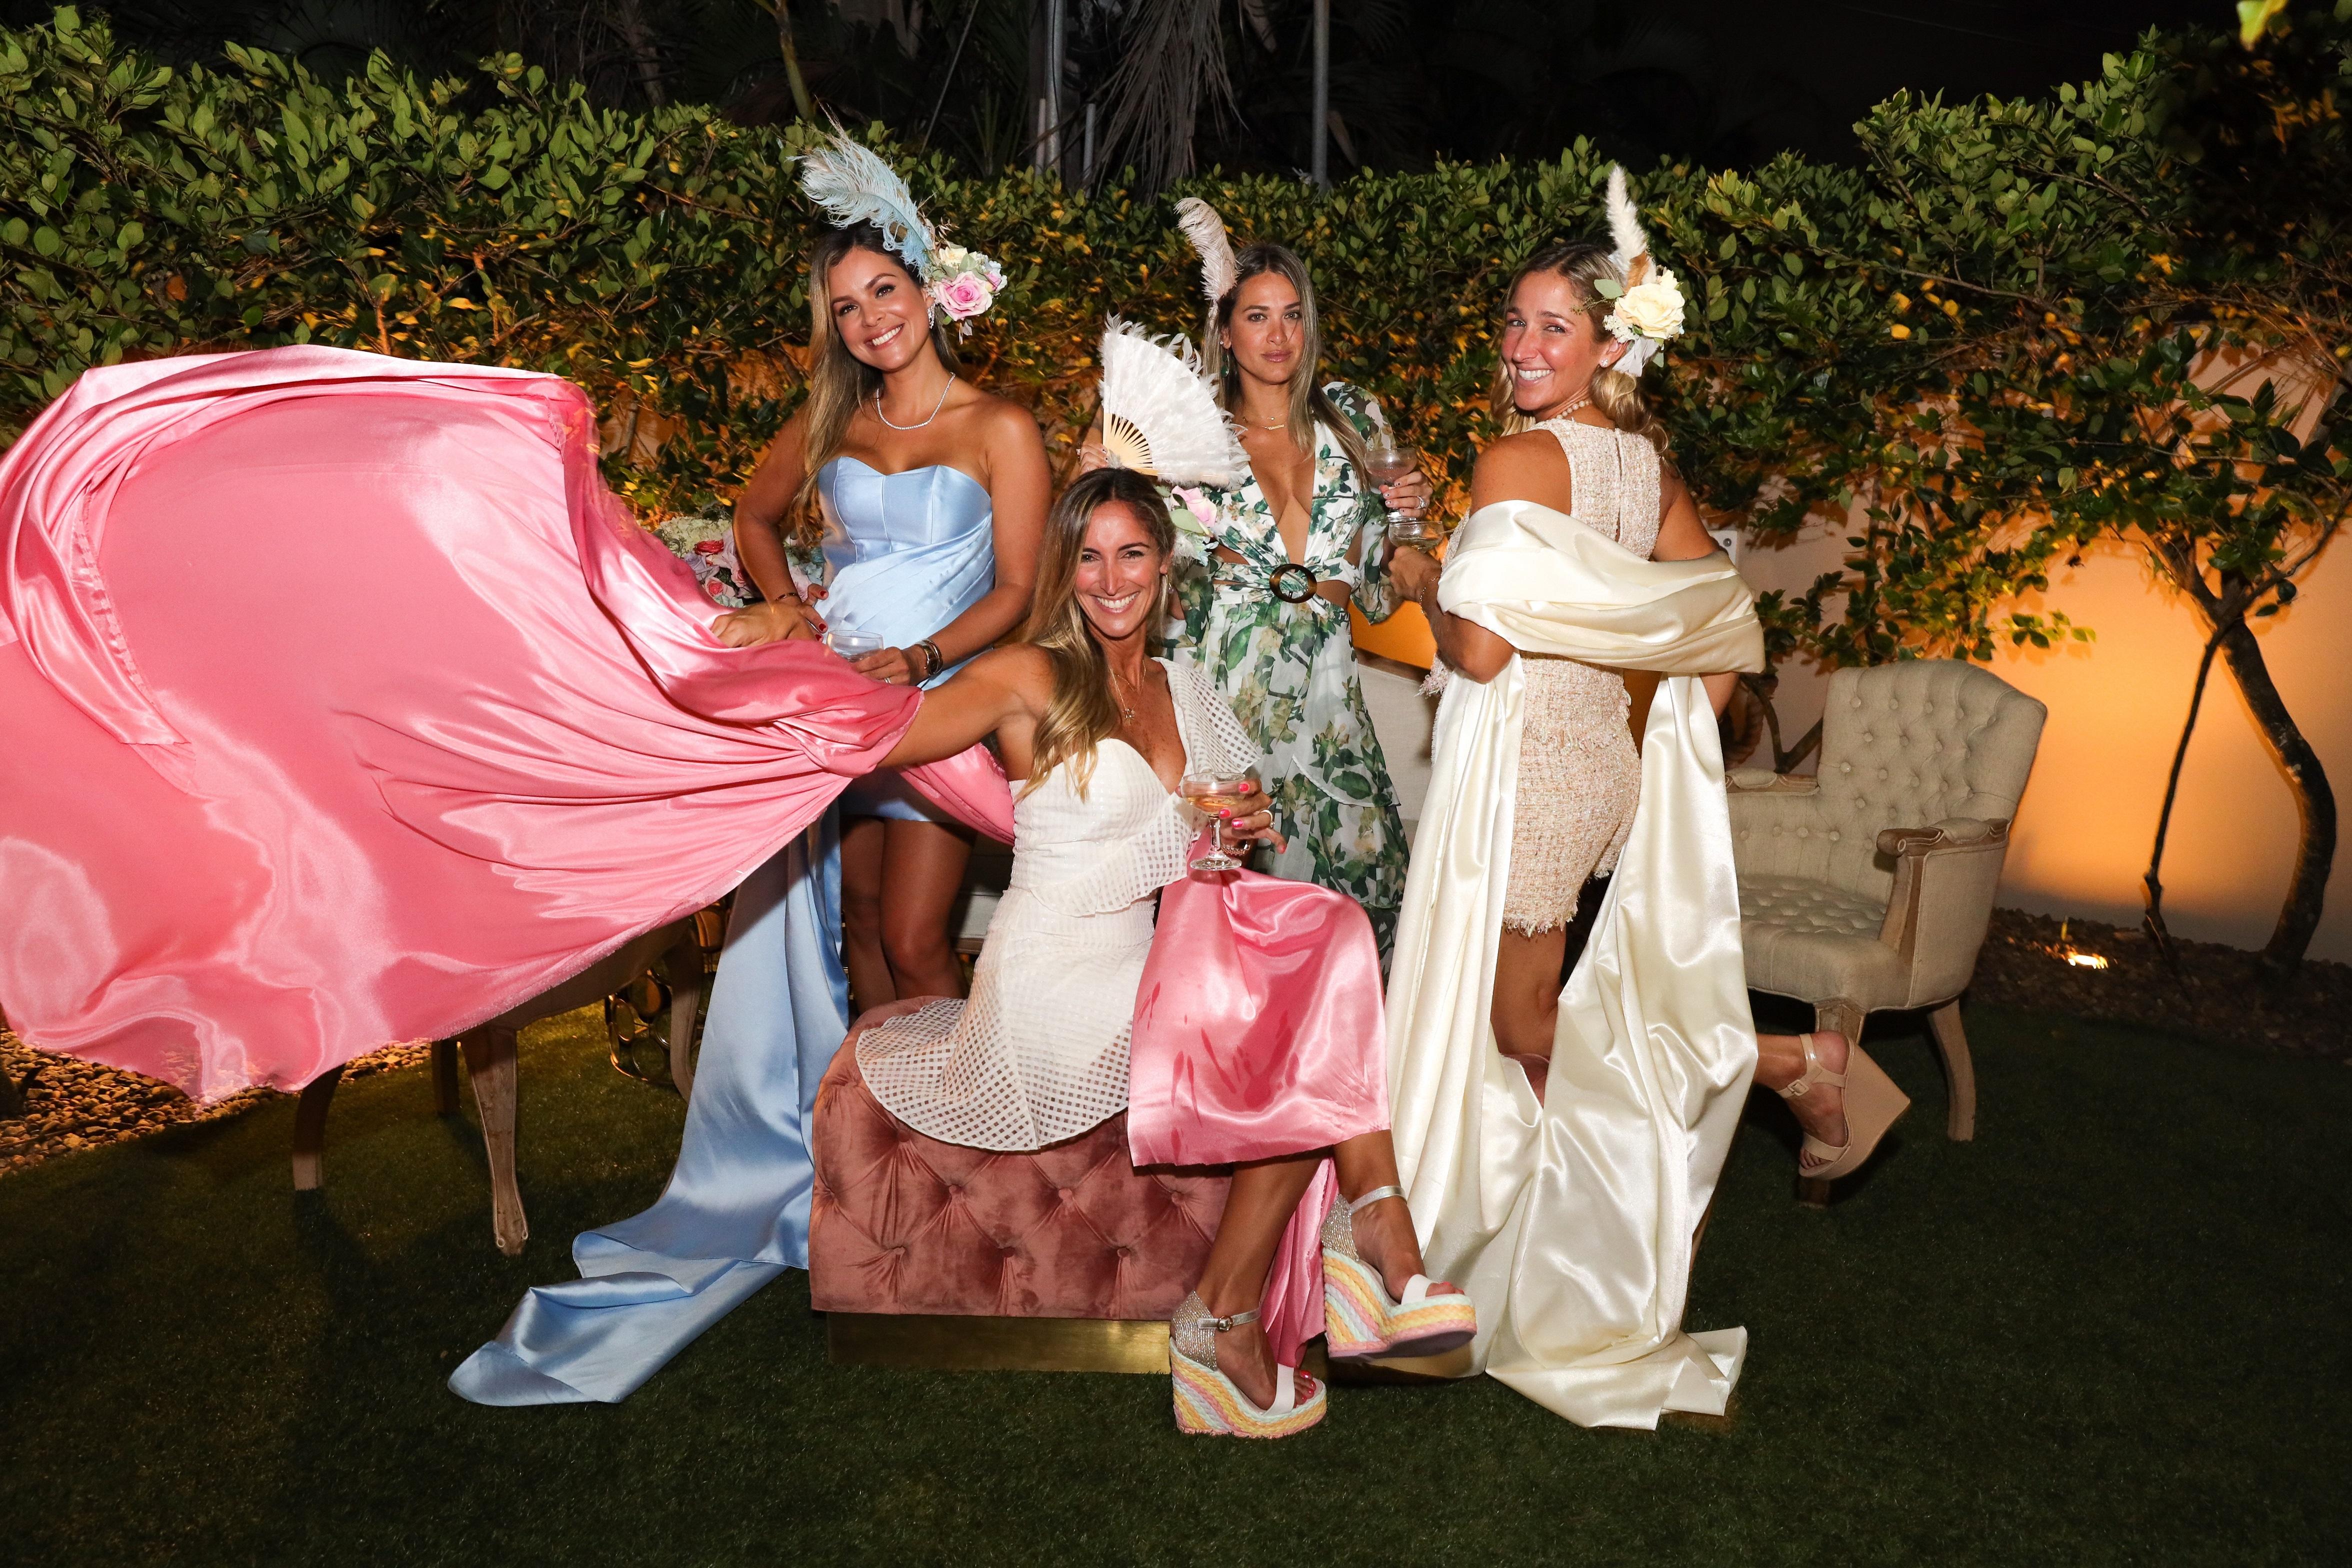 Mónica Ponce, Bianca Thon, Verónica Arias y Viviana Thon. (Suministrada/Karina Margary)